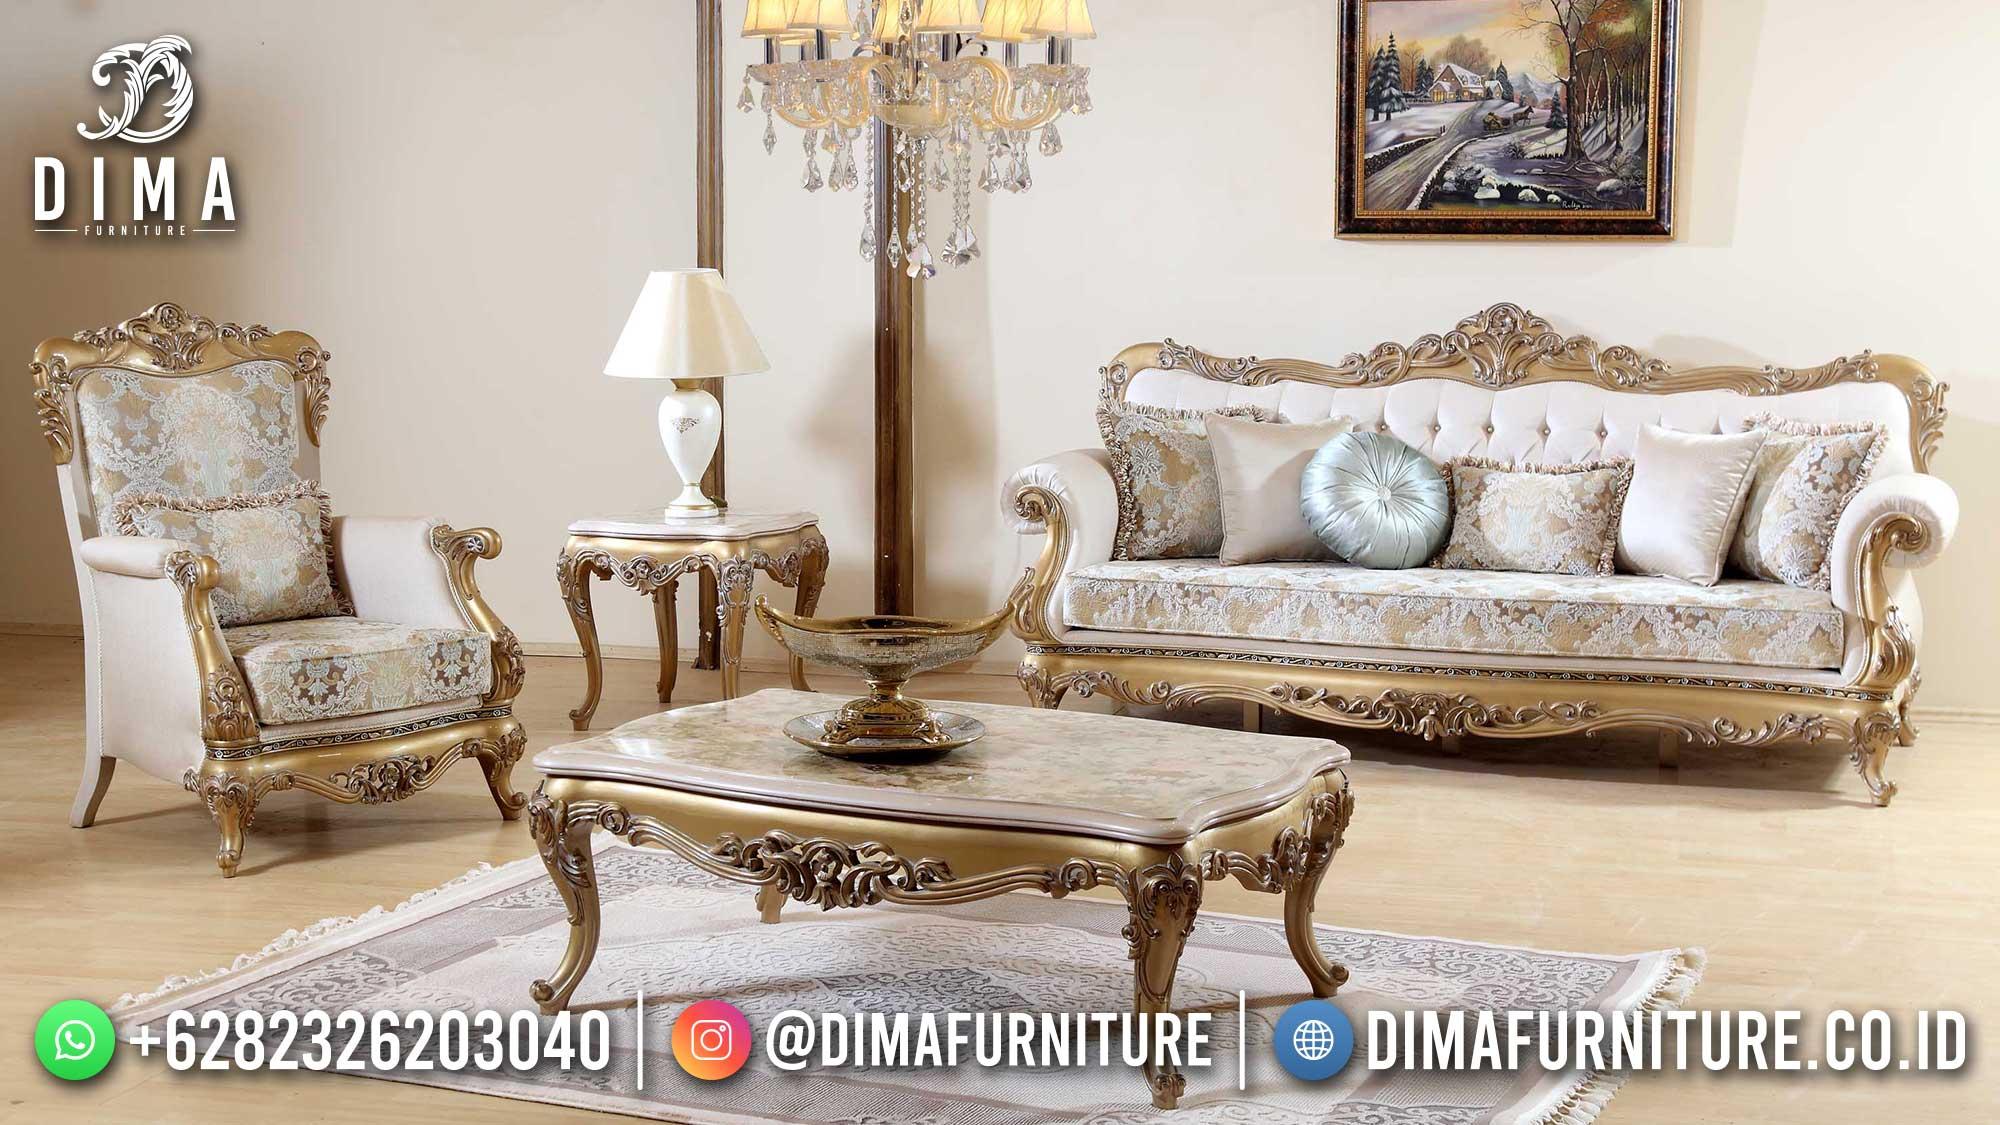 Sofa Tamu Mewah Jepara Golden Luxury Color Great 100 % High Quality ST-1459